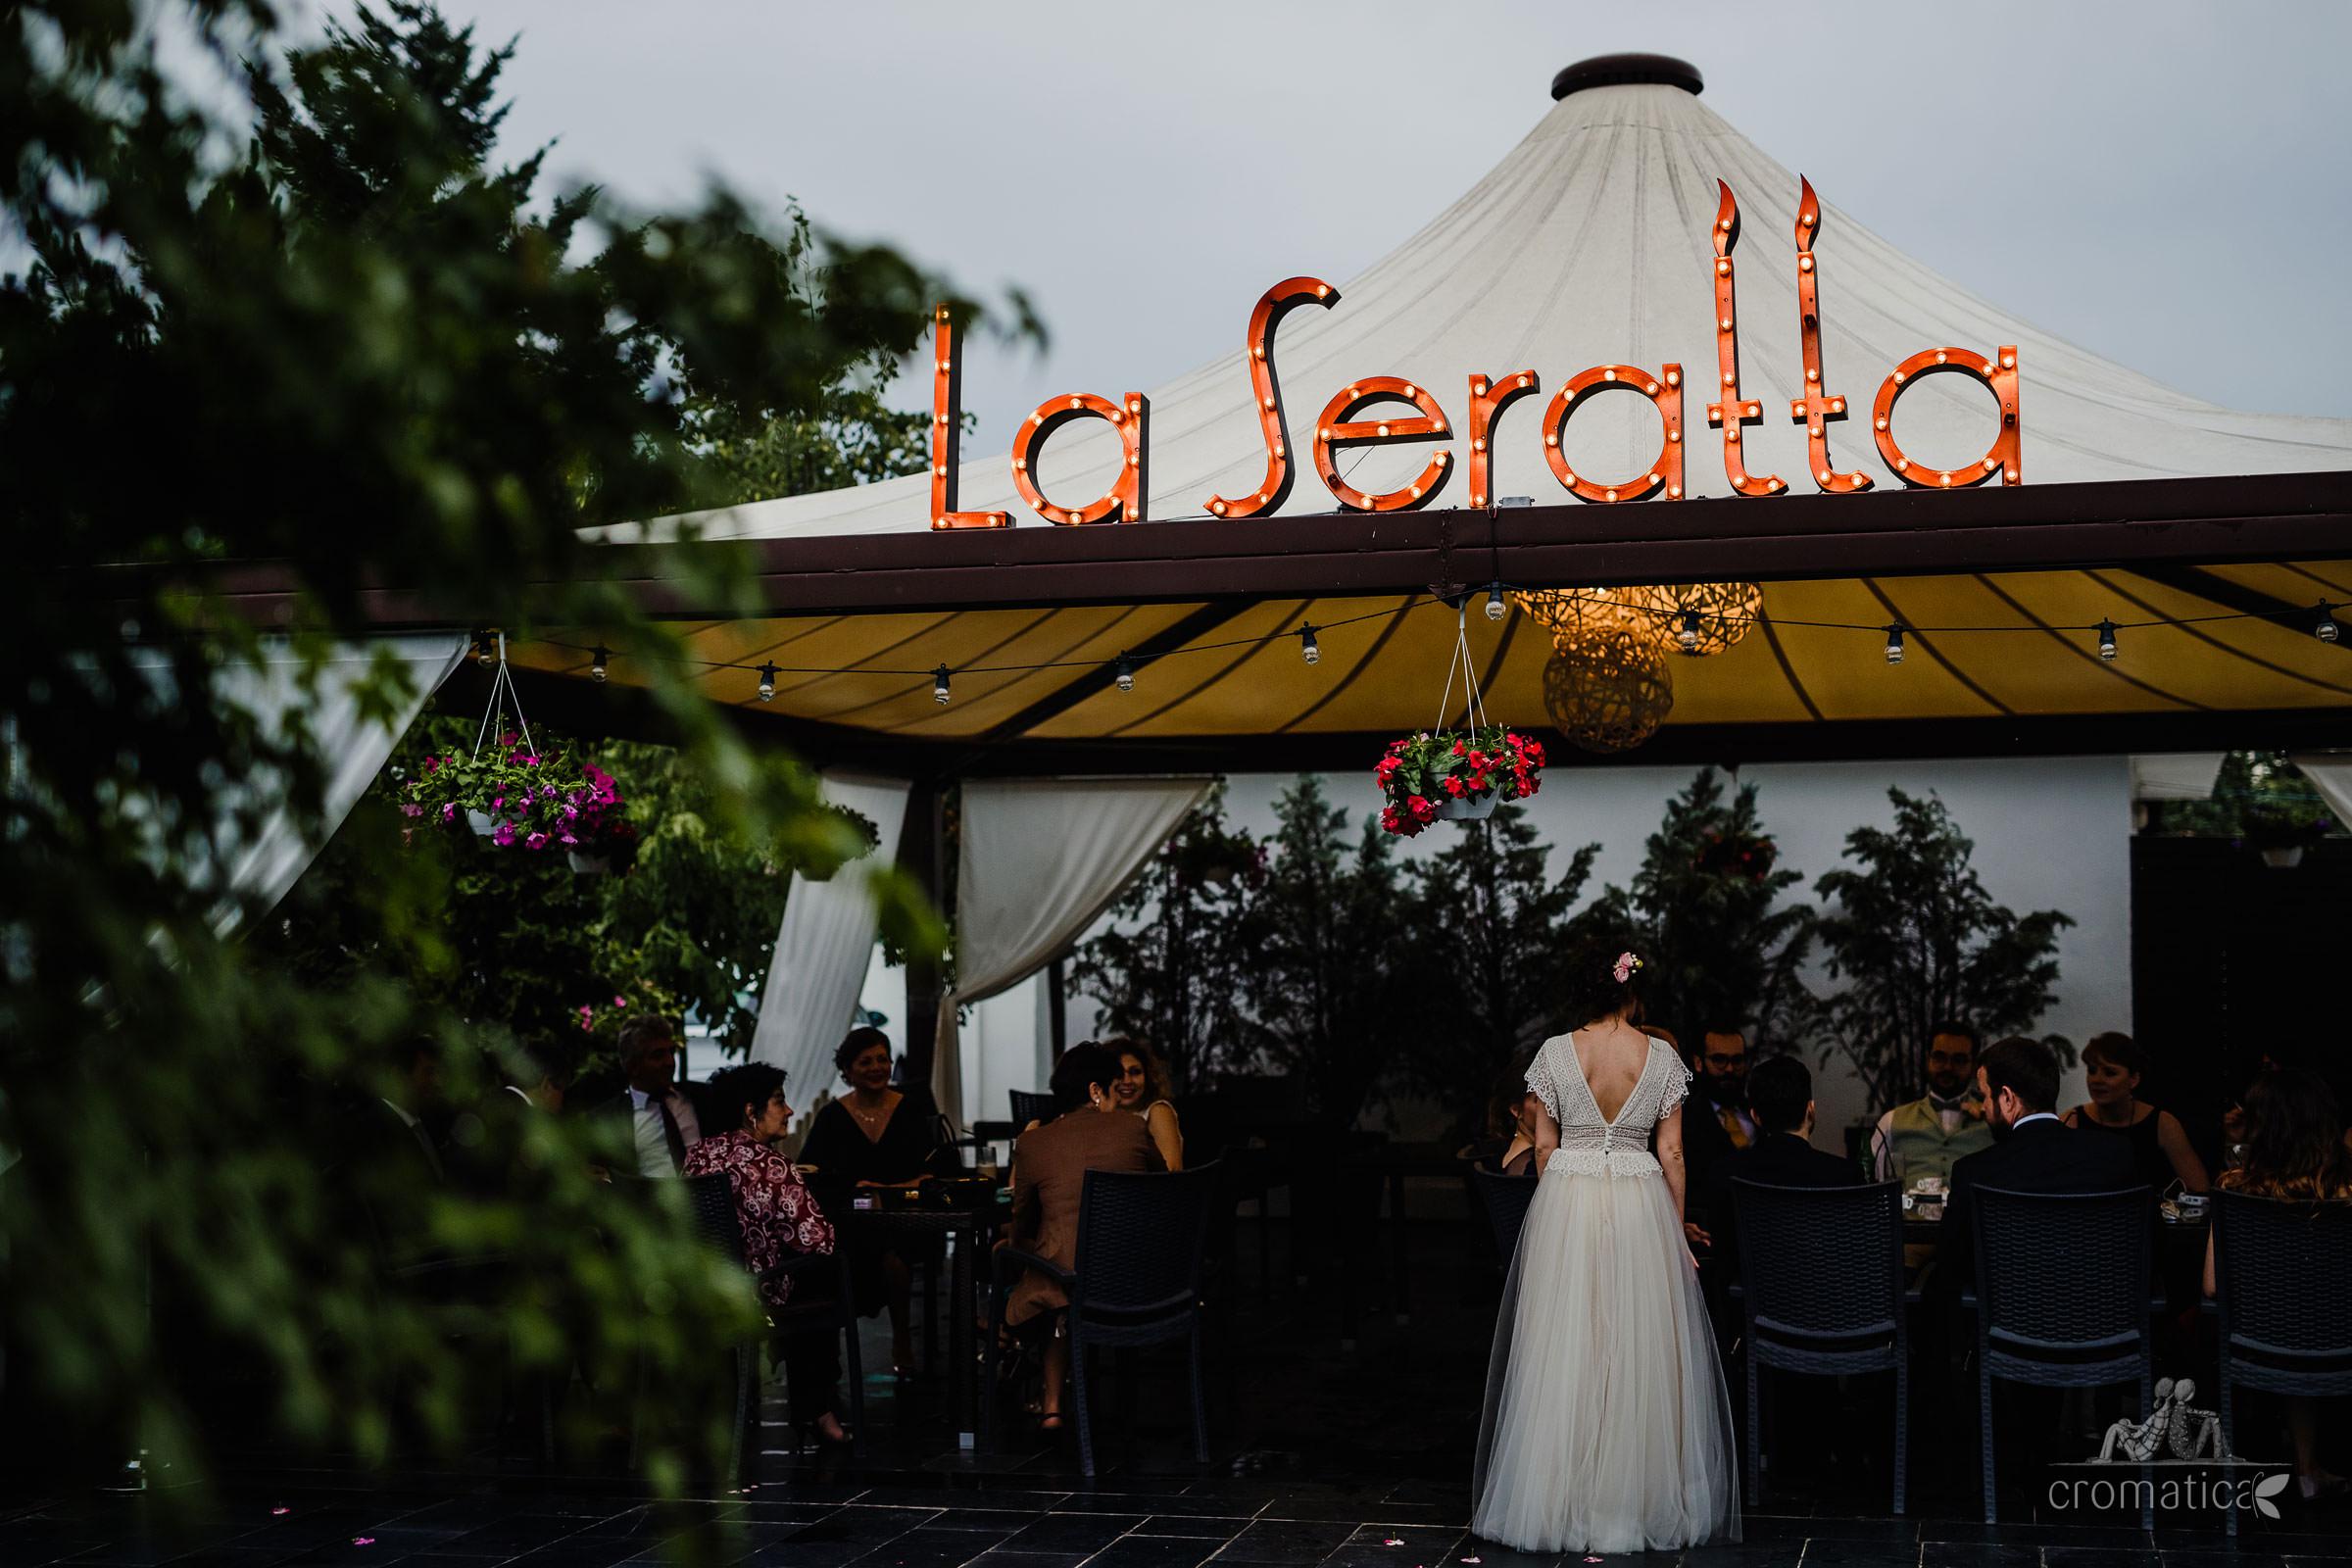 roxana mihai fotografii nunta la seratta 054